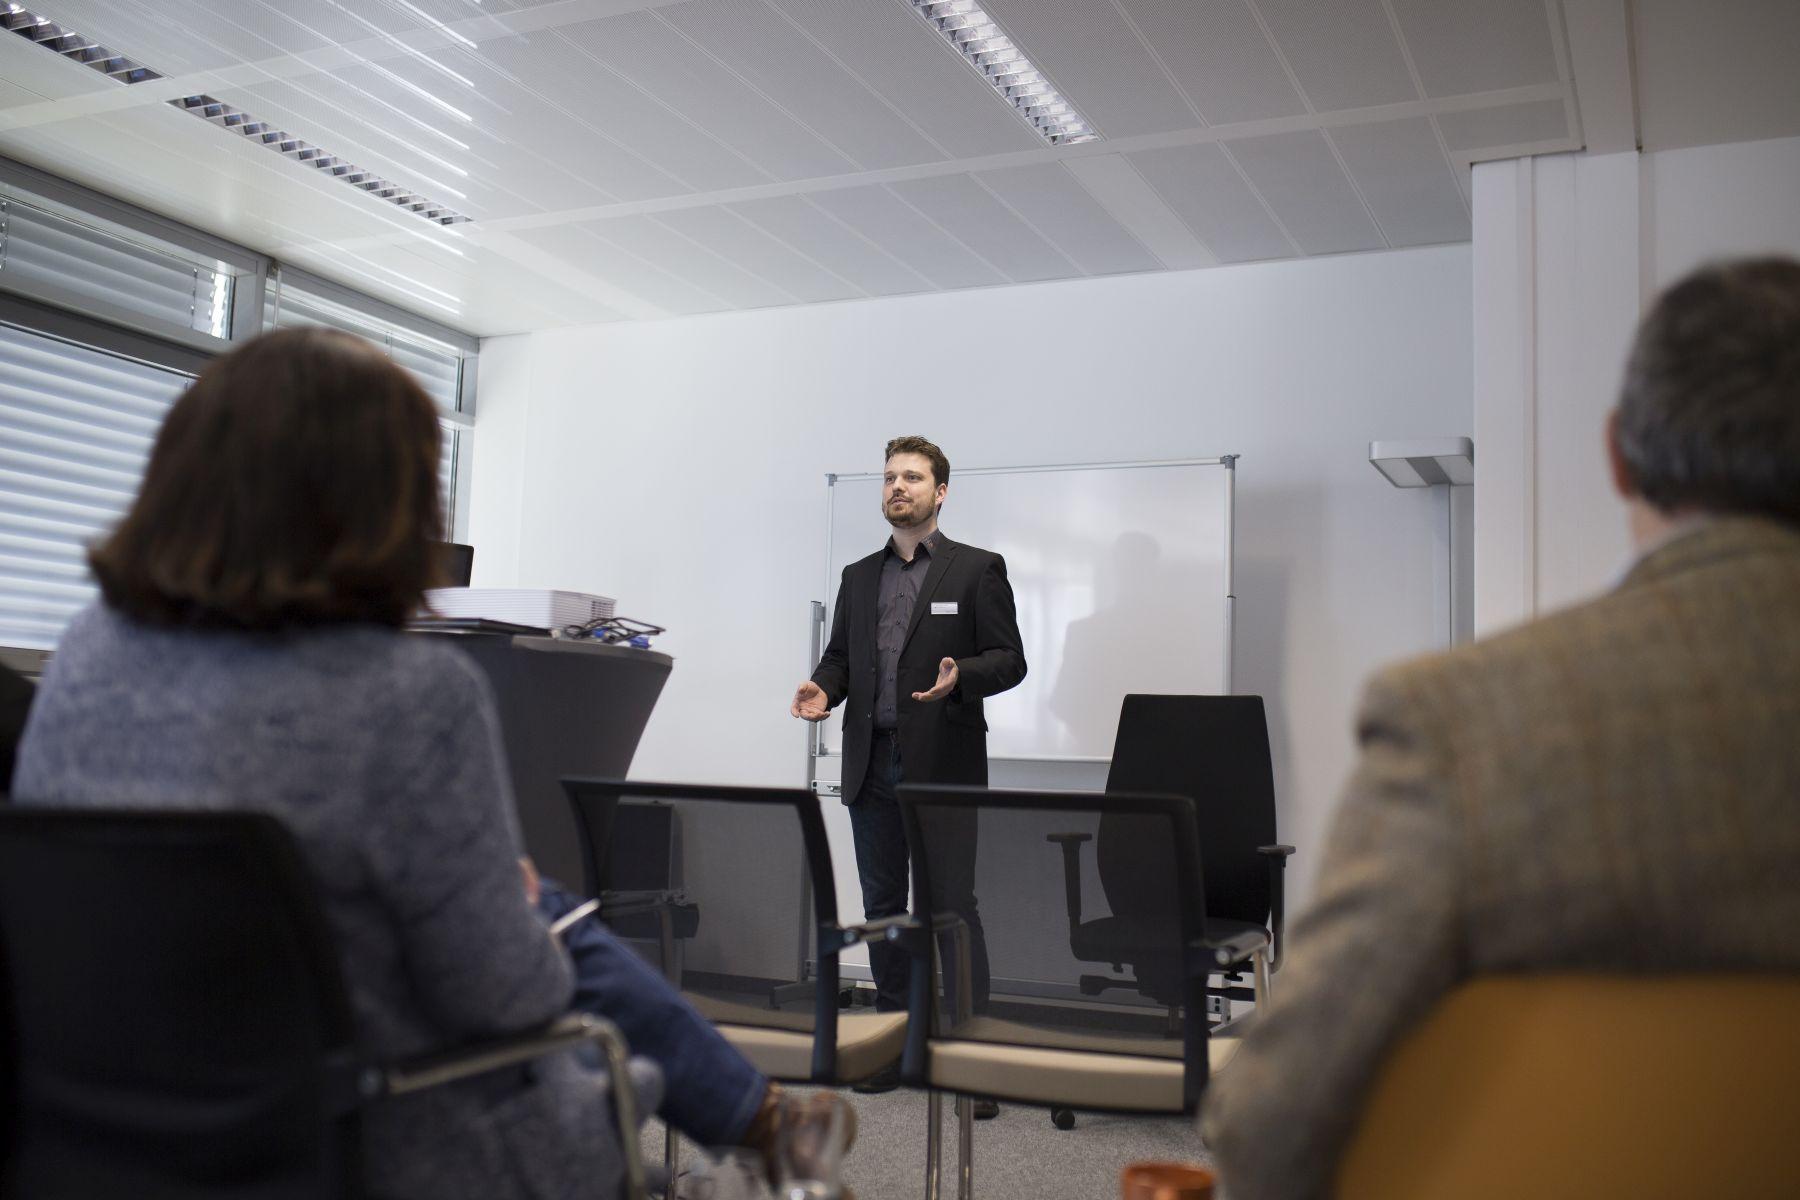 Rückblick: Ergonomie in 5 Punkten - Infoveranstaltung bei Büromöbel-Experte 10